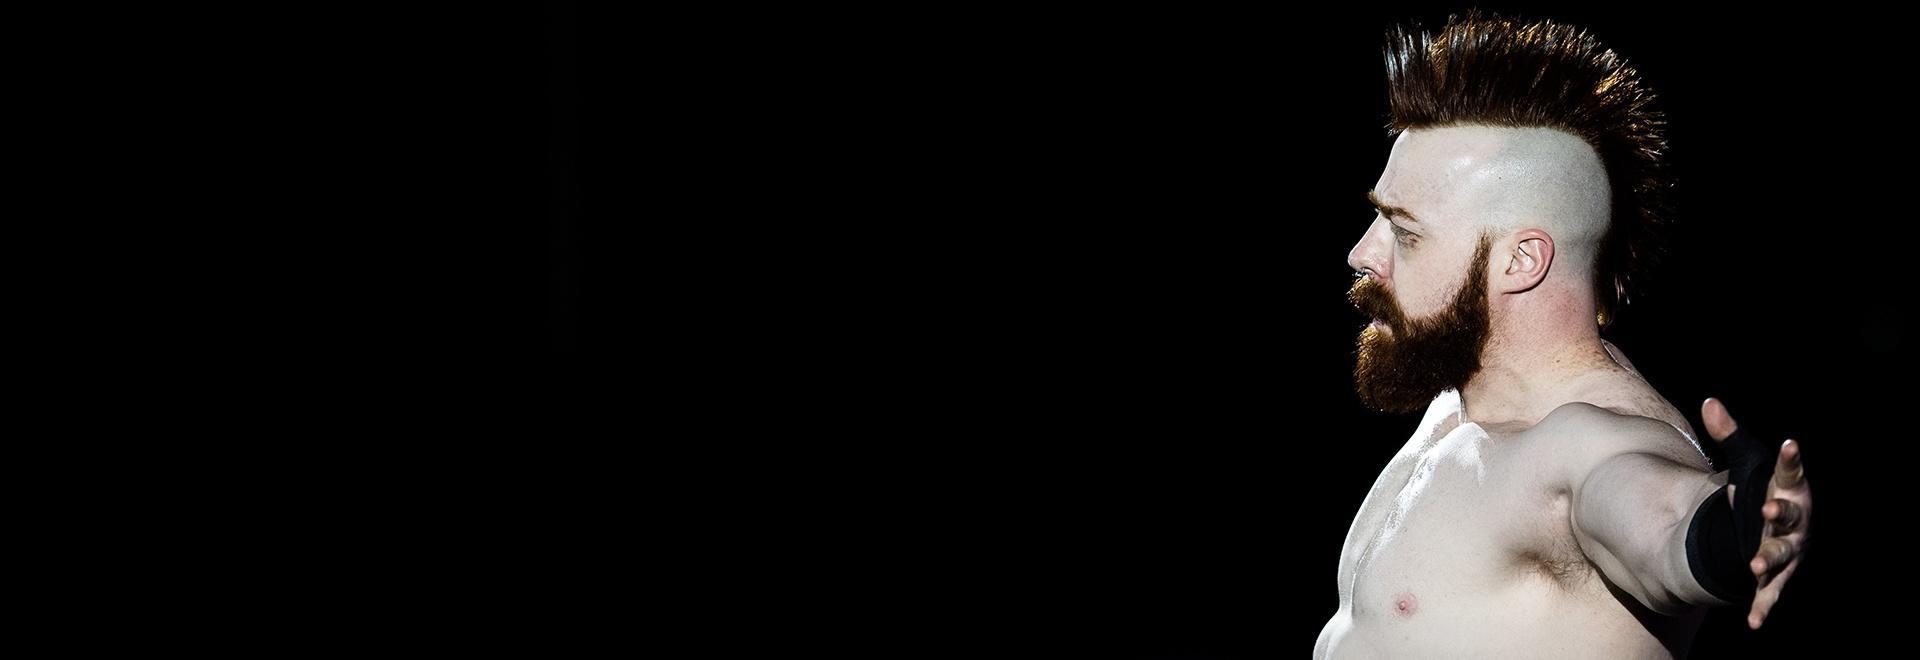 Ep. 41